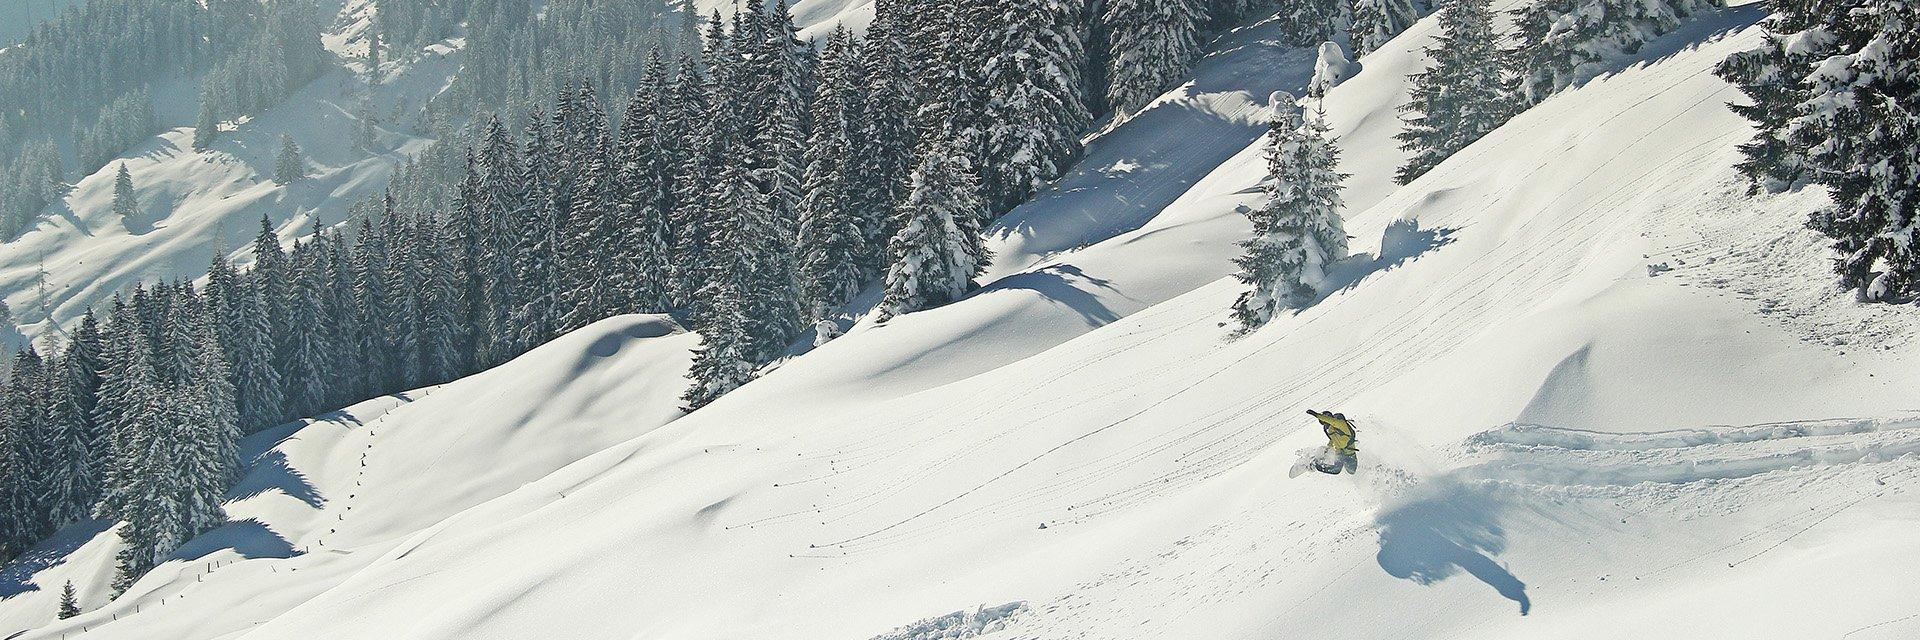 Stephan Verheij deep powder. (Pic: Roy Mosterd)